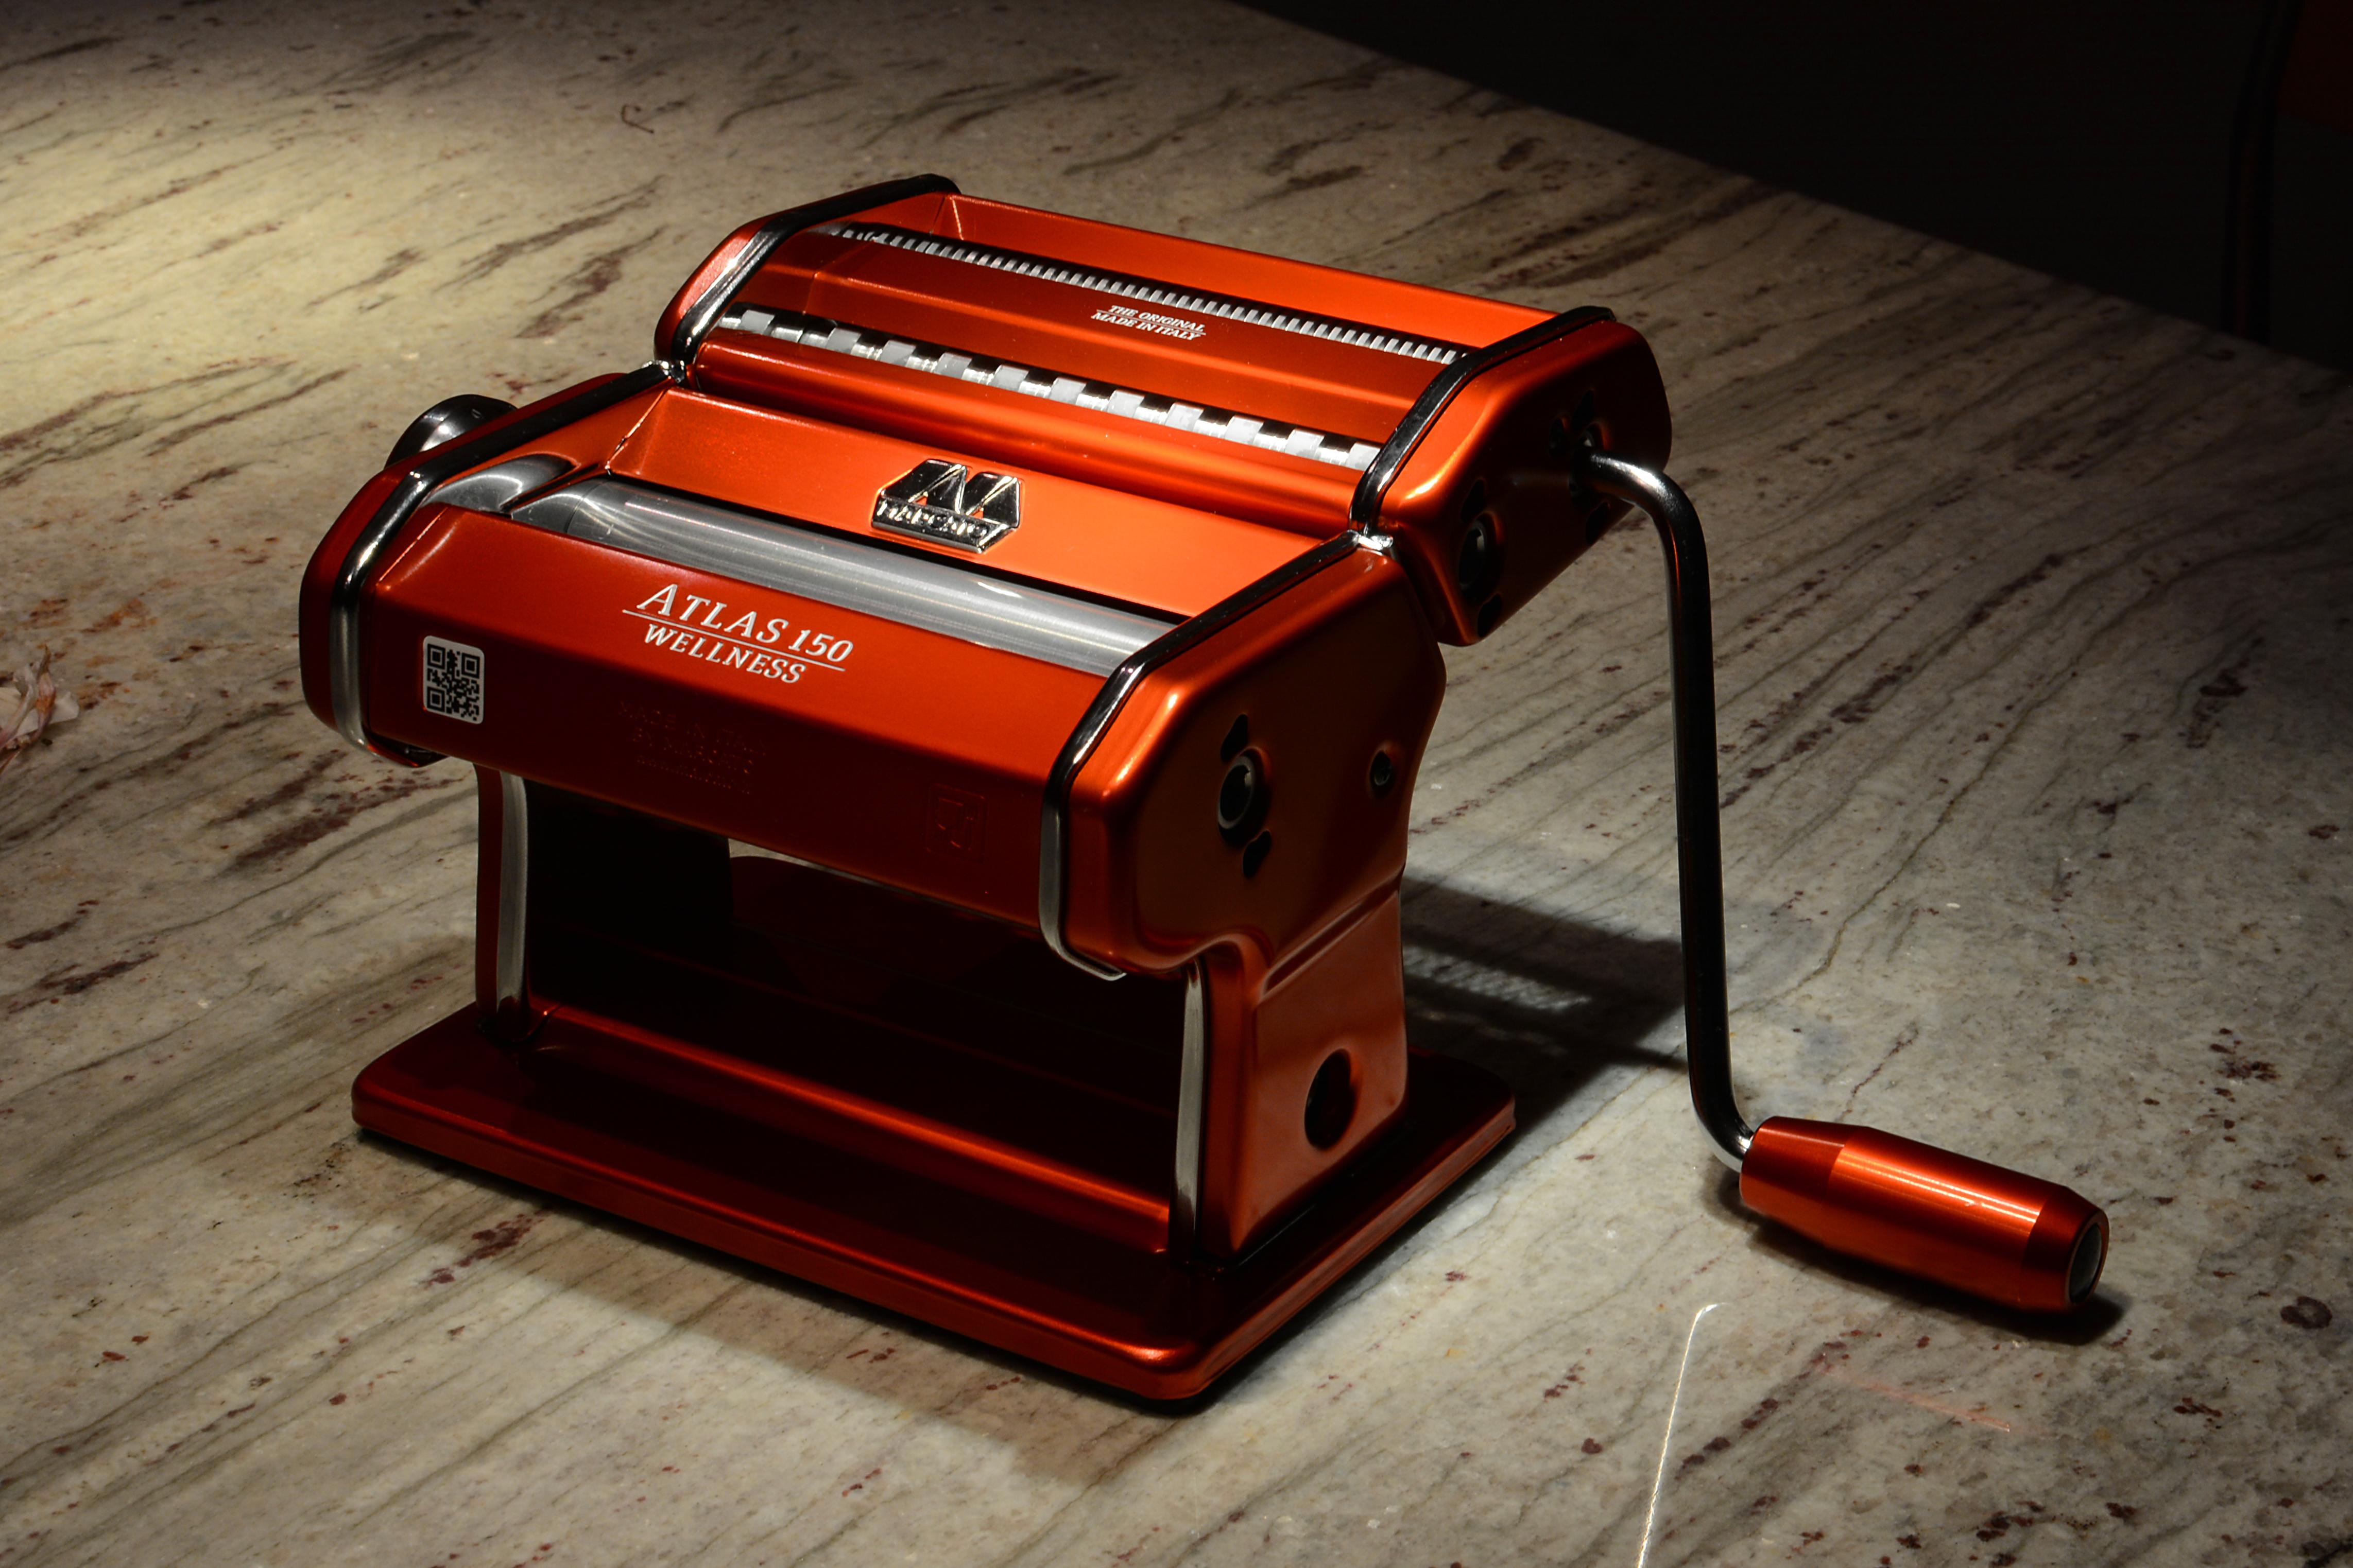 Marcato Multipast Pasta and Ravioli Machine Set: Amazon.ca: Home ...